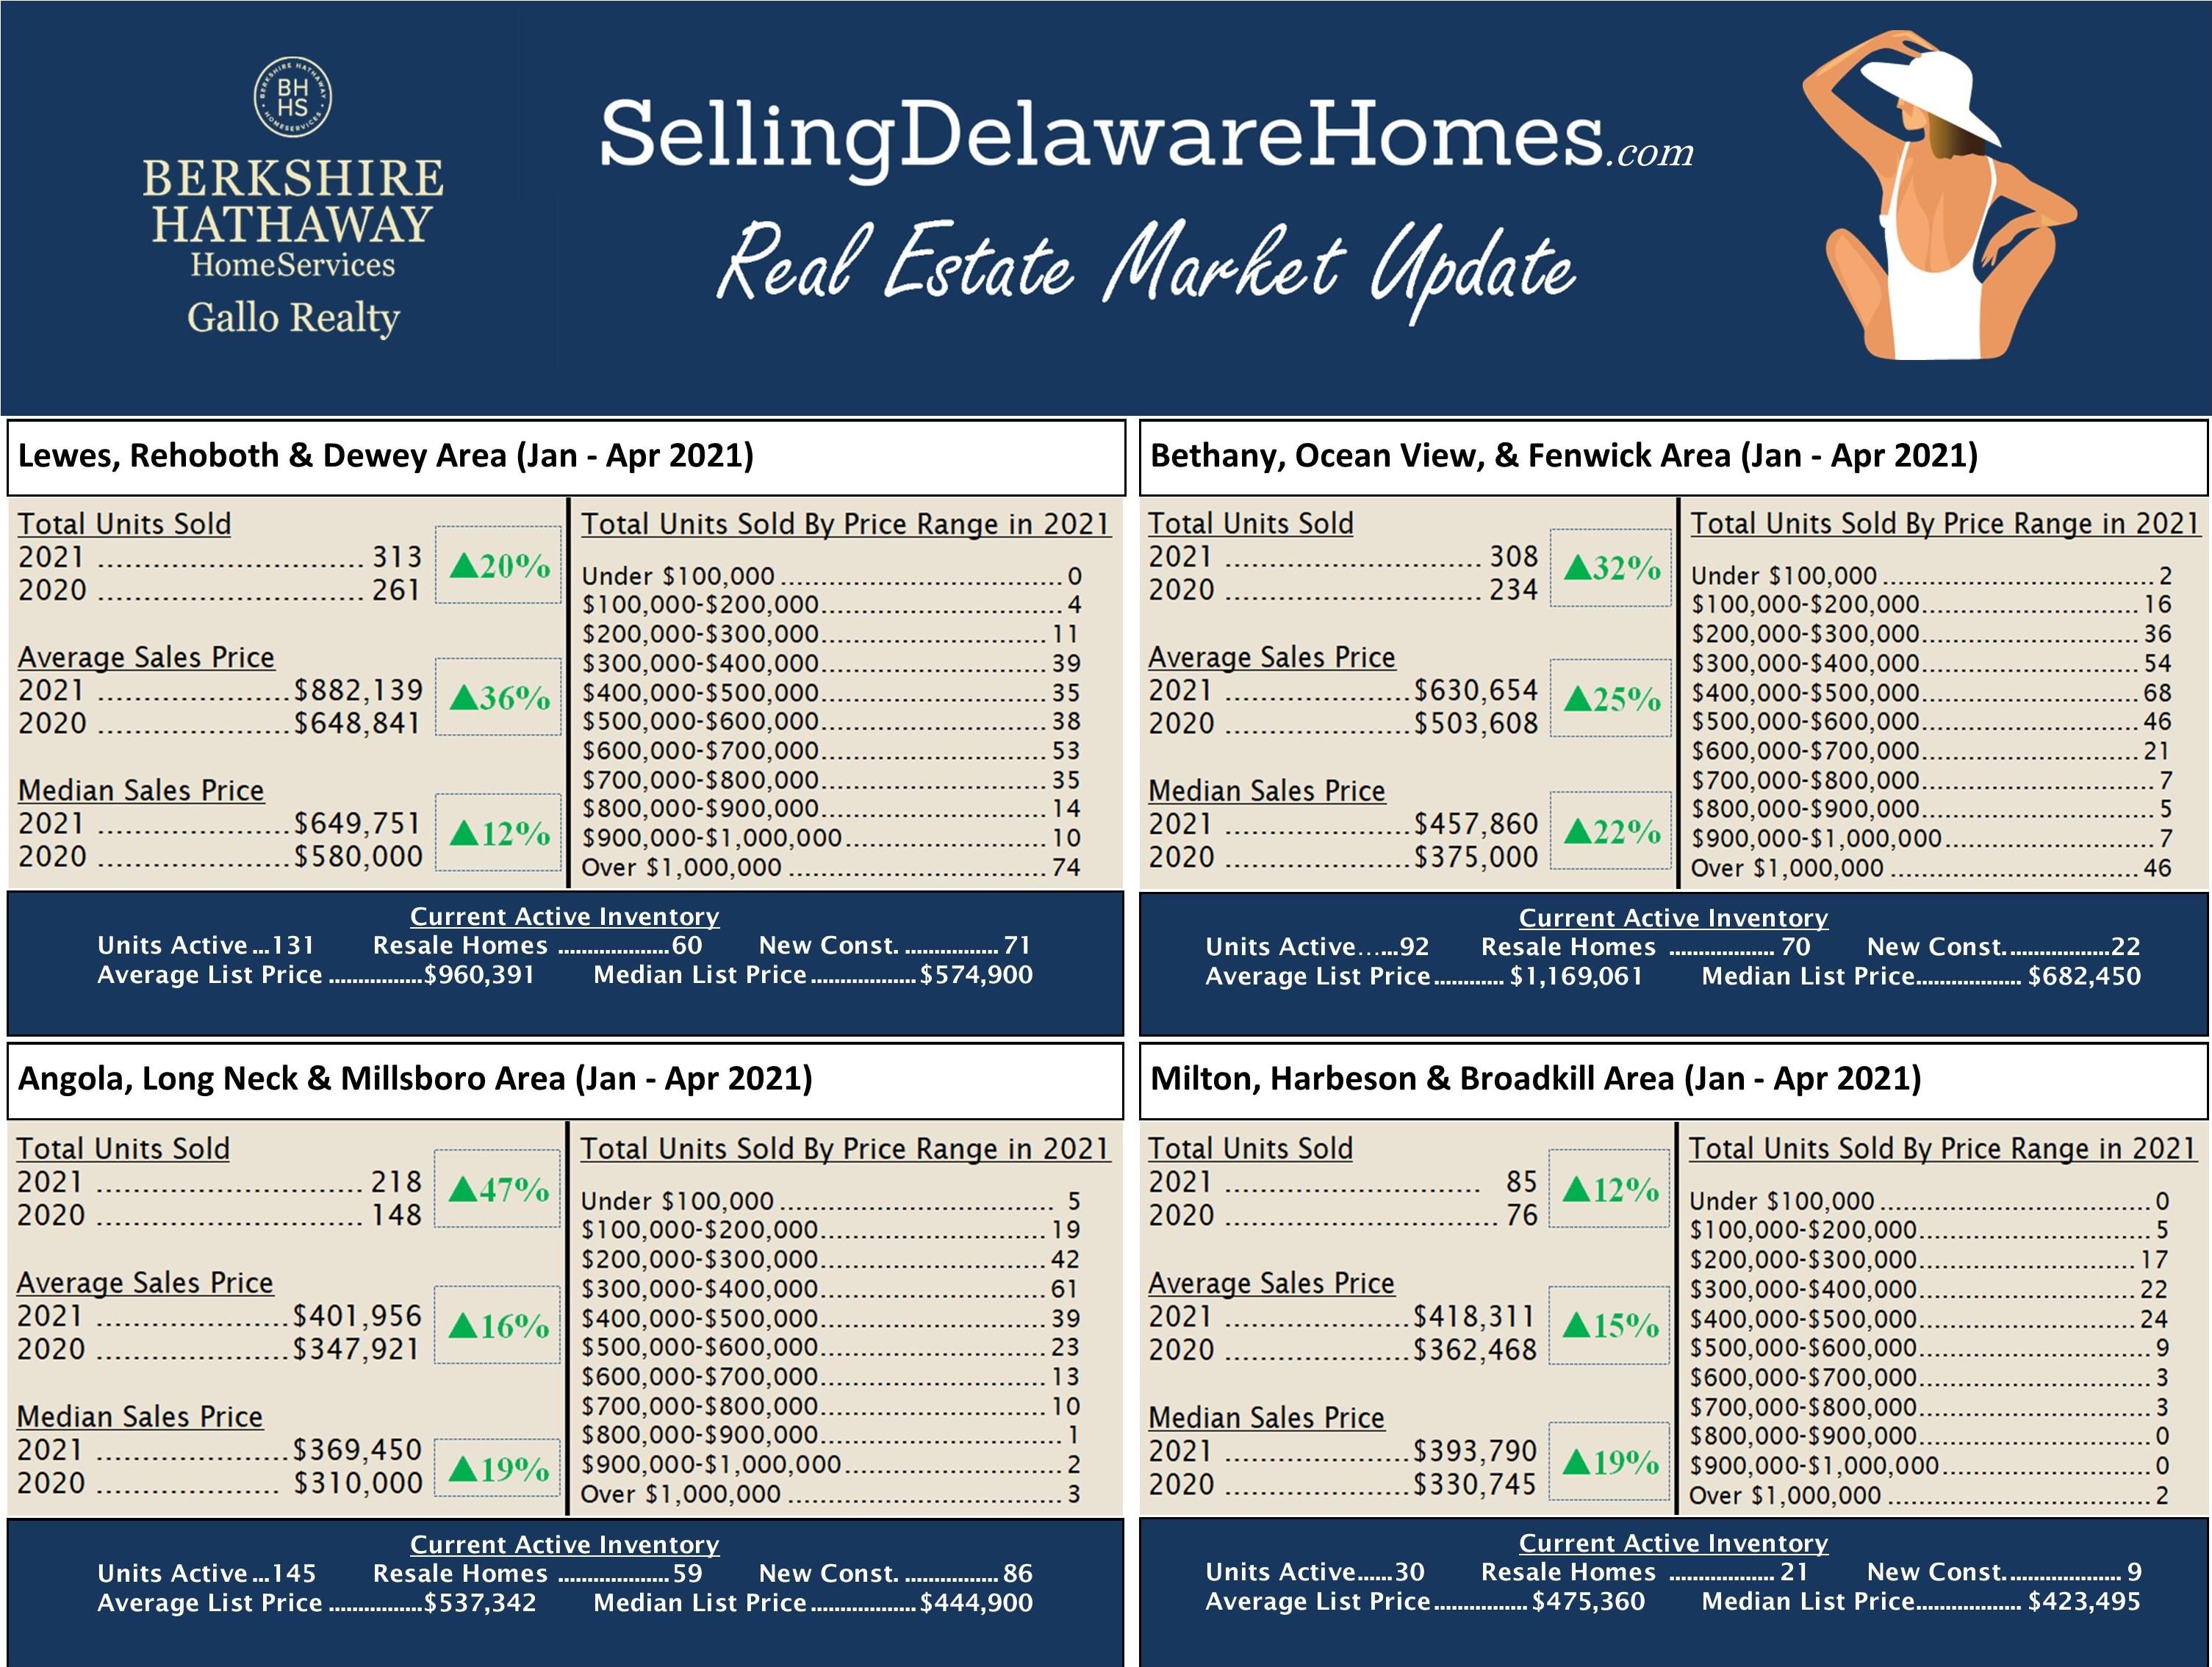 Jan-Apr 2021 Real Estate Market Update Sussex County, DE